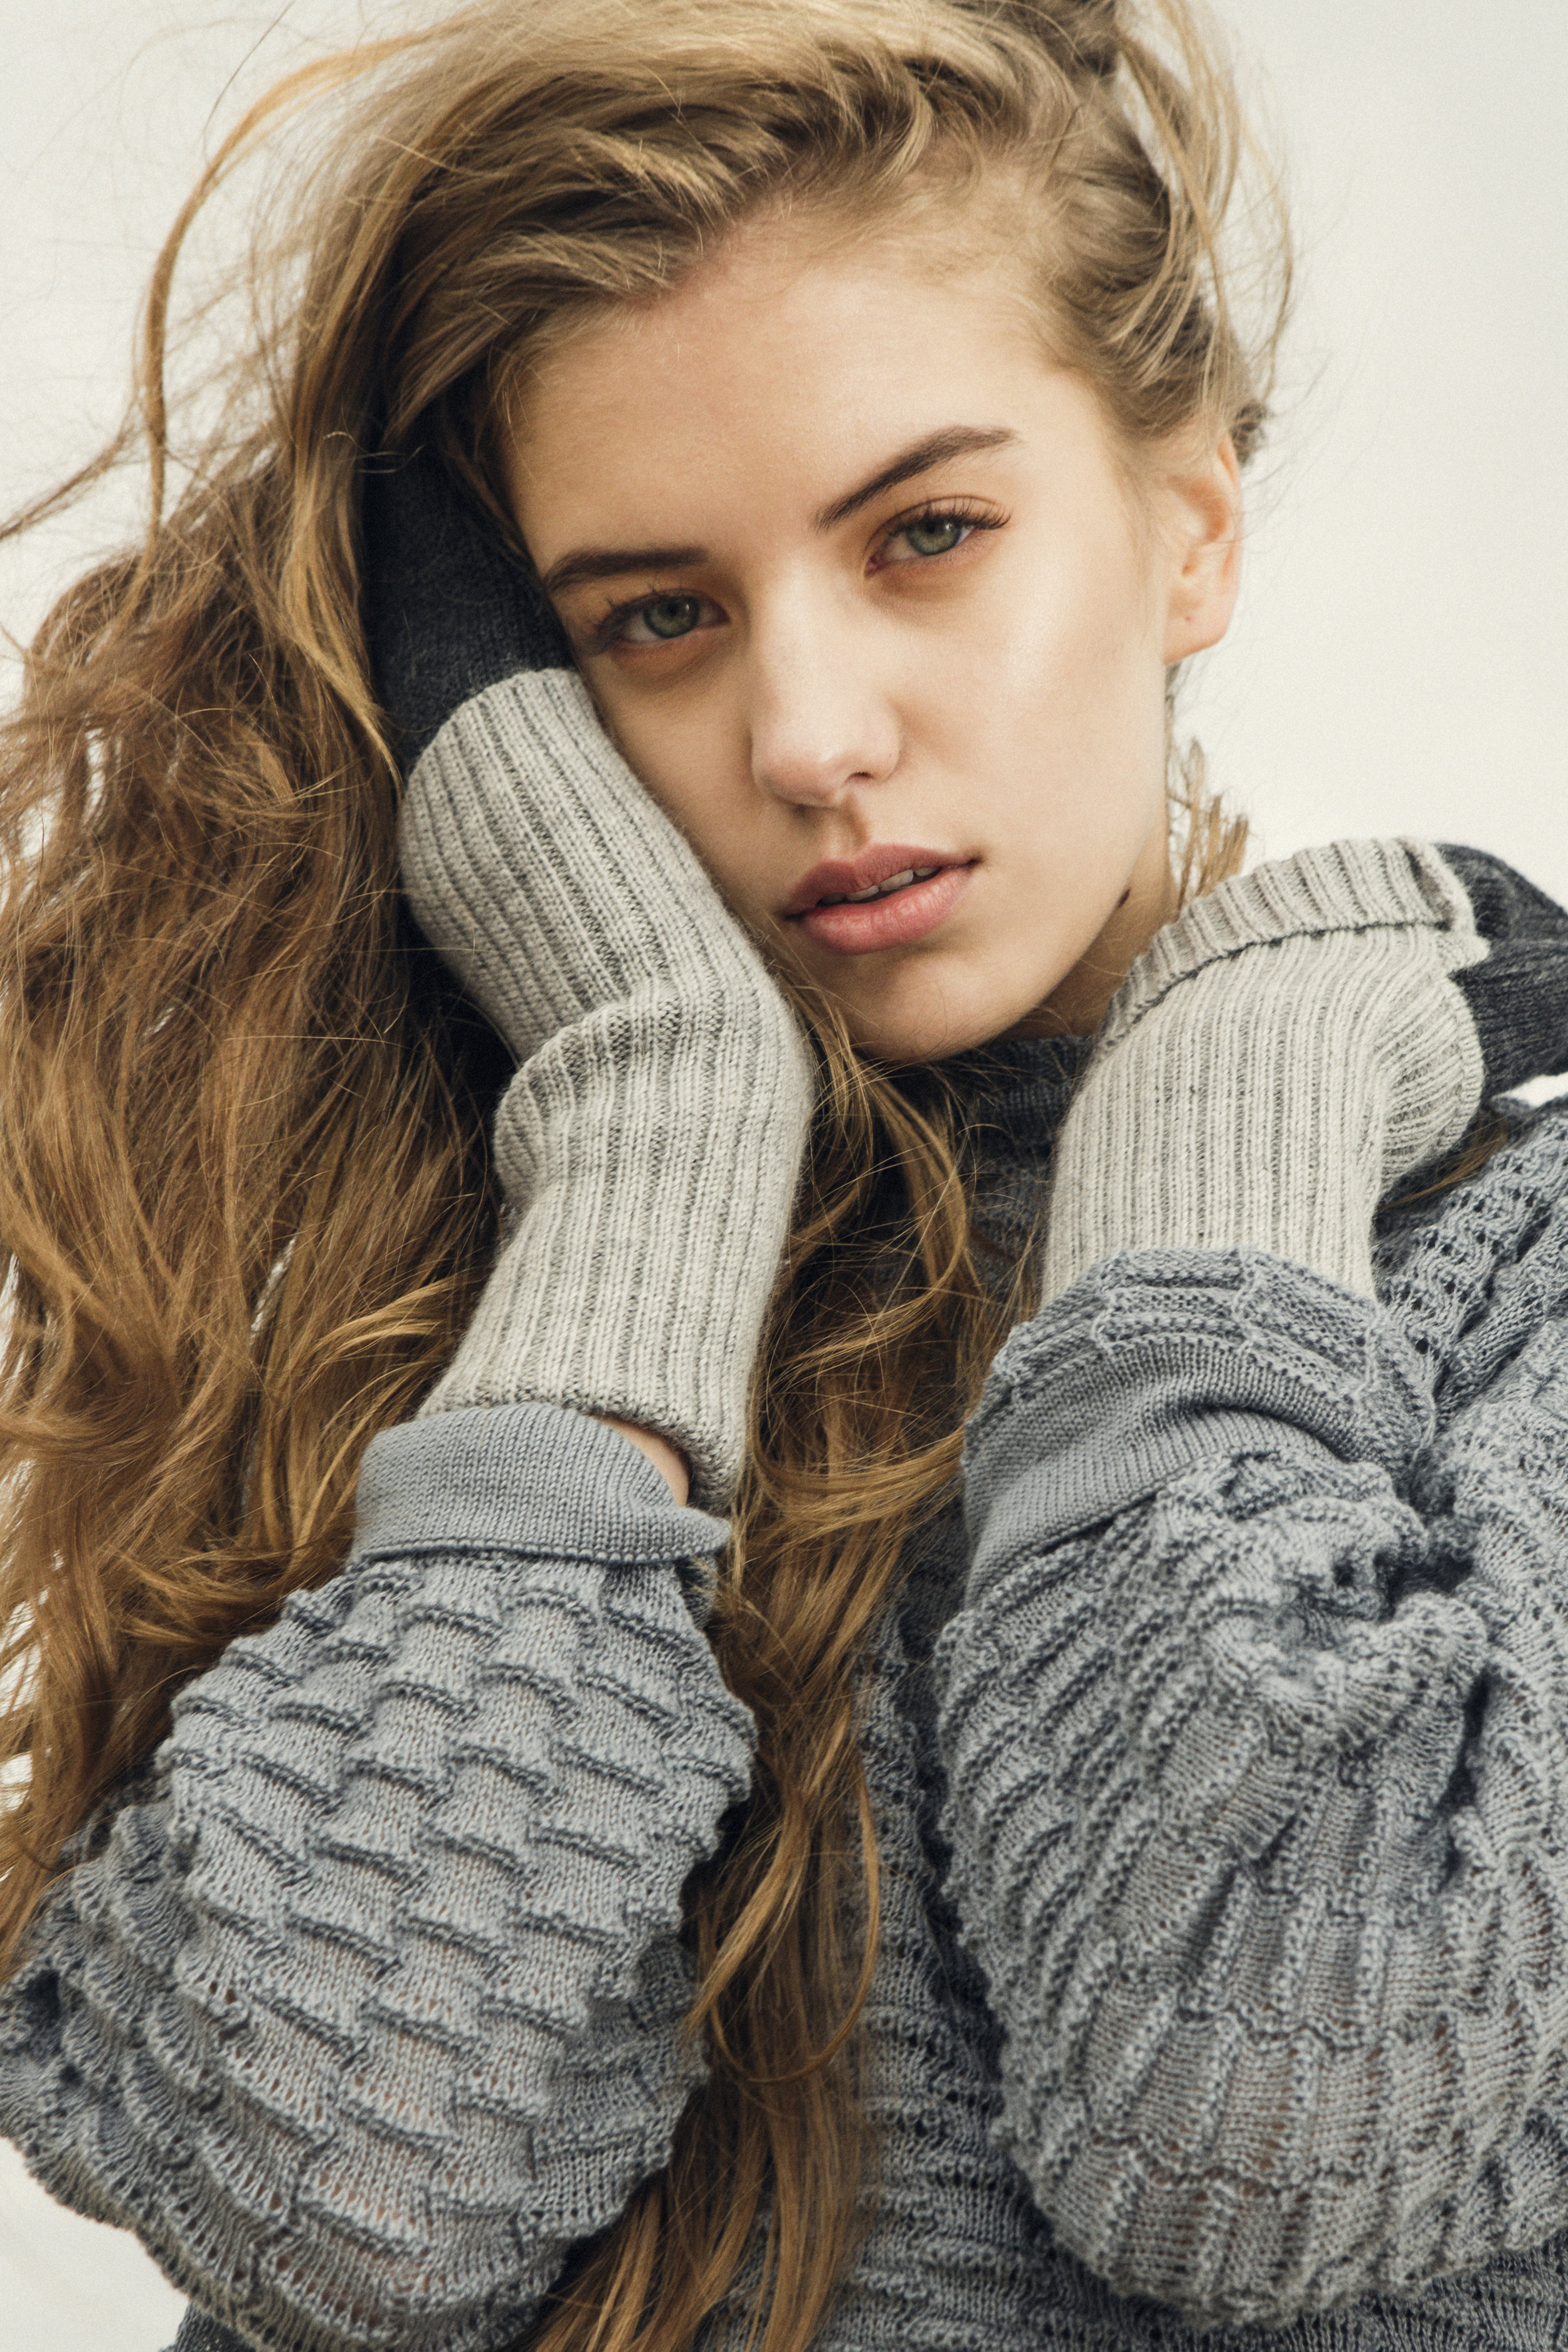 Liisa Soolepp's 'Talismans': Ethical Knitwear #Savant  - Image: Jana Solom /MUA: Marii Lotta / Styling: Marian Eespäev / Model: Saskia Maria (Icon)